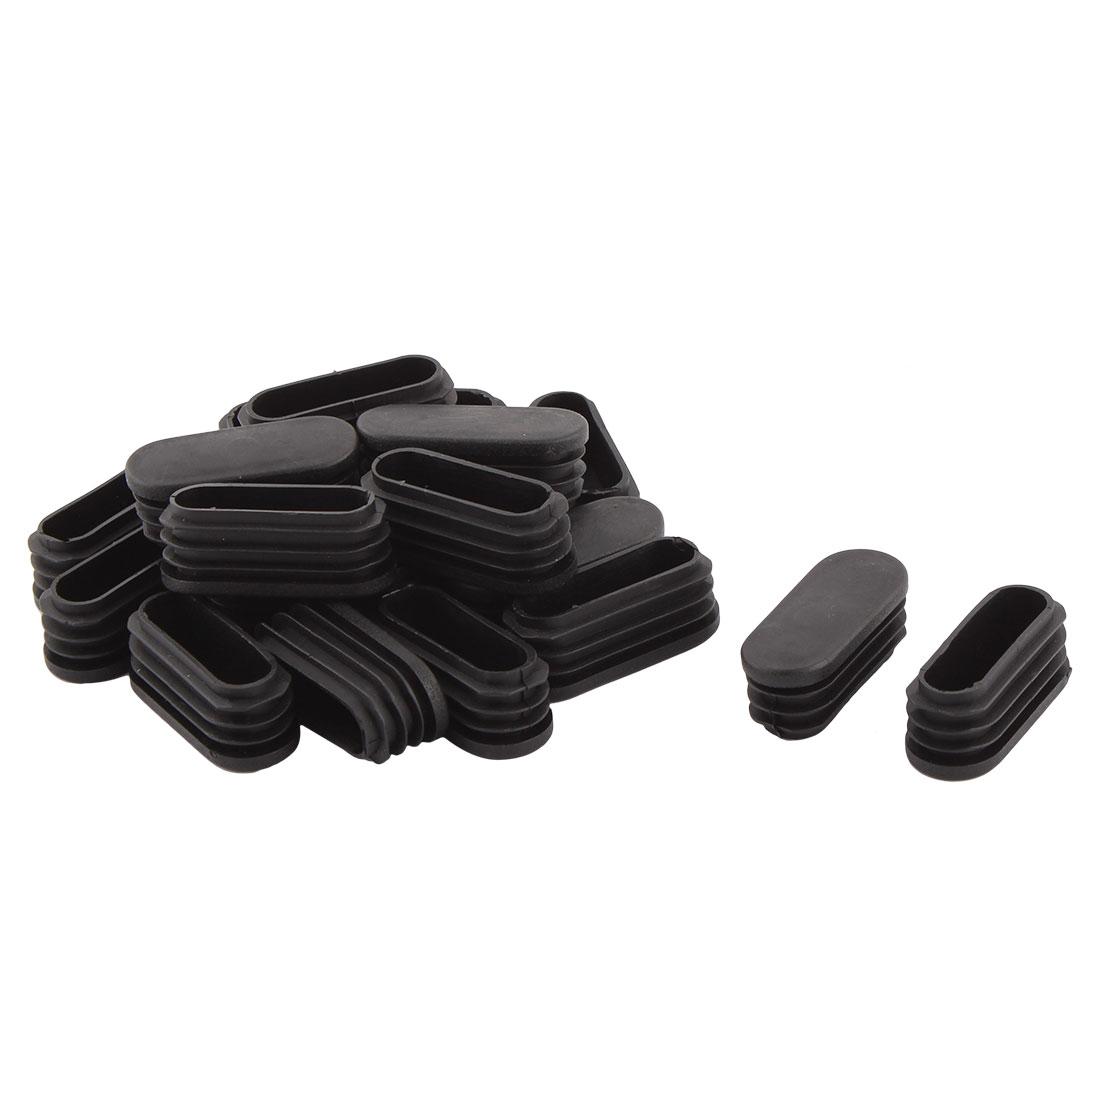 Table Feet Plastic Oval Design Tube Pipe Insert End Cap Black 50mm x 20mm 20 Pcs